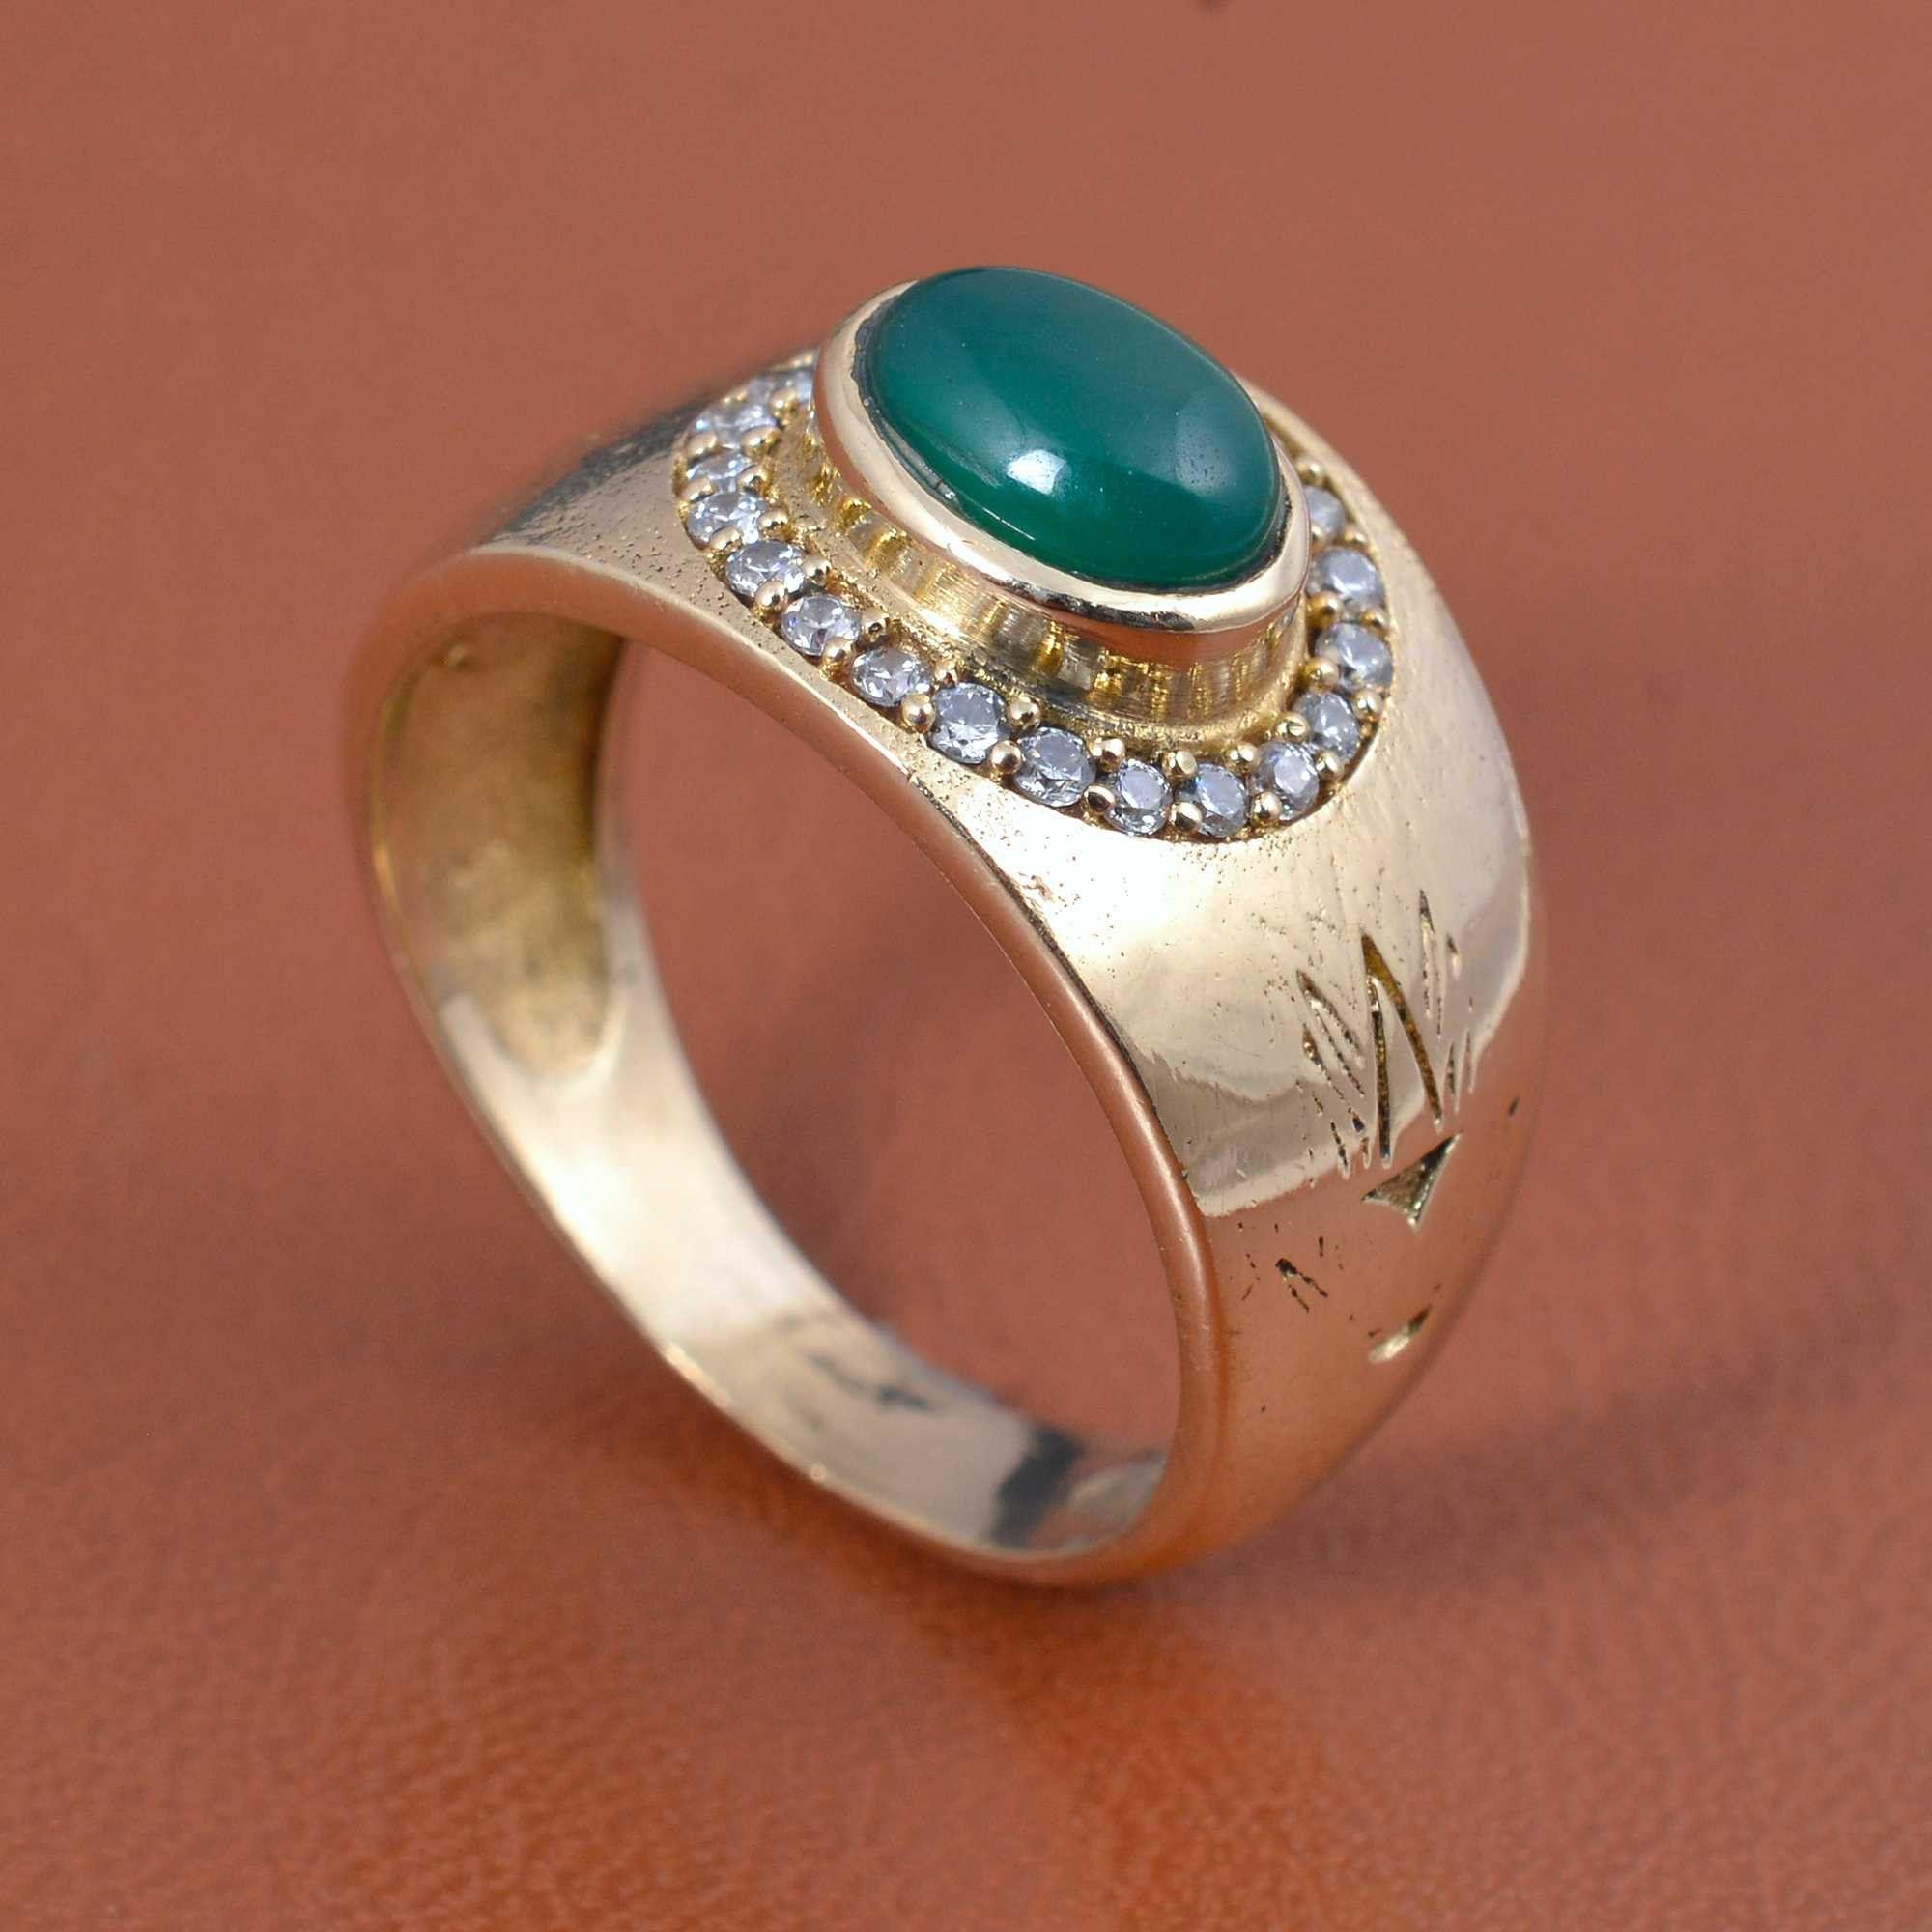 Black Onyx Ring,Handmade Ring,Brass Gemstone Ring,Statement Ring,Rings For Women,Boho Rings,Promise Ring,Wedding Ring,Personalized Gift